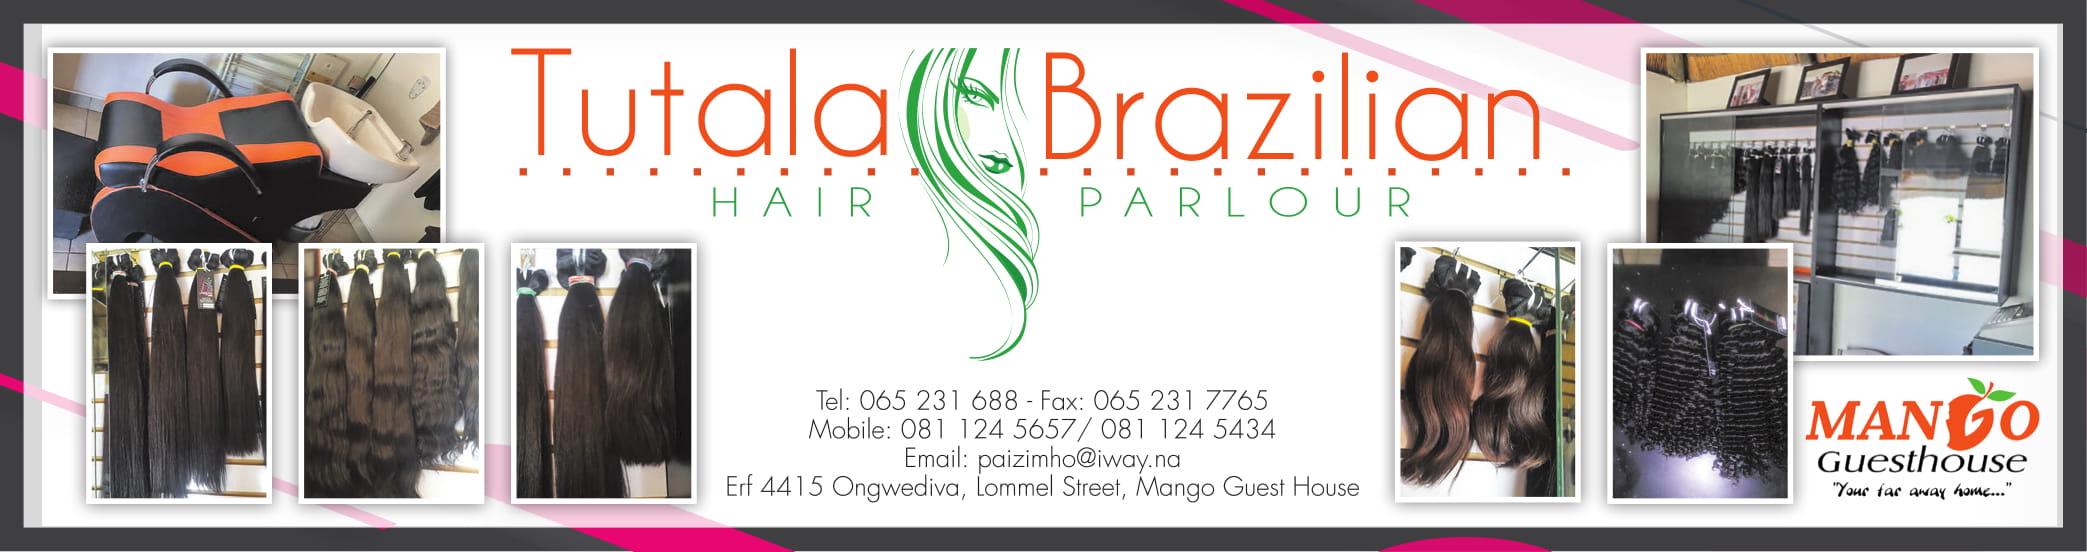 Tutala Brazilian Hair Parlour